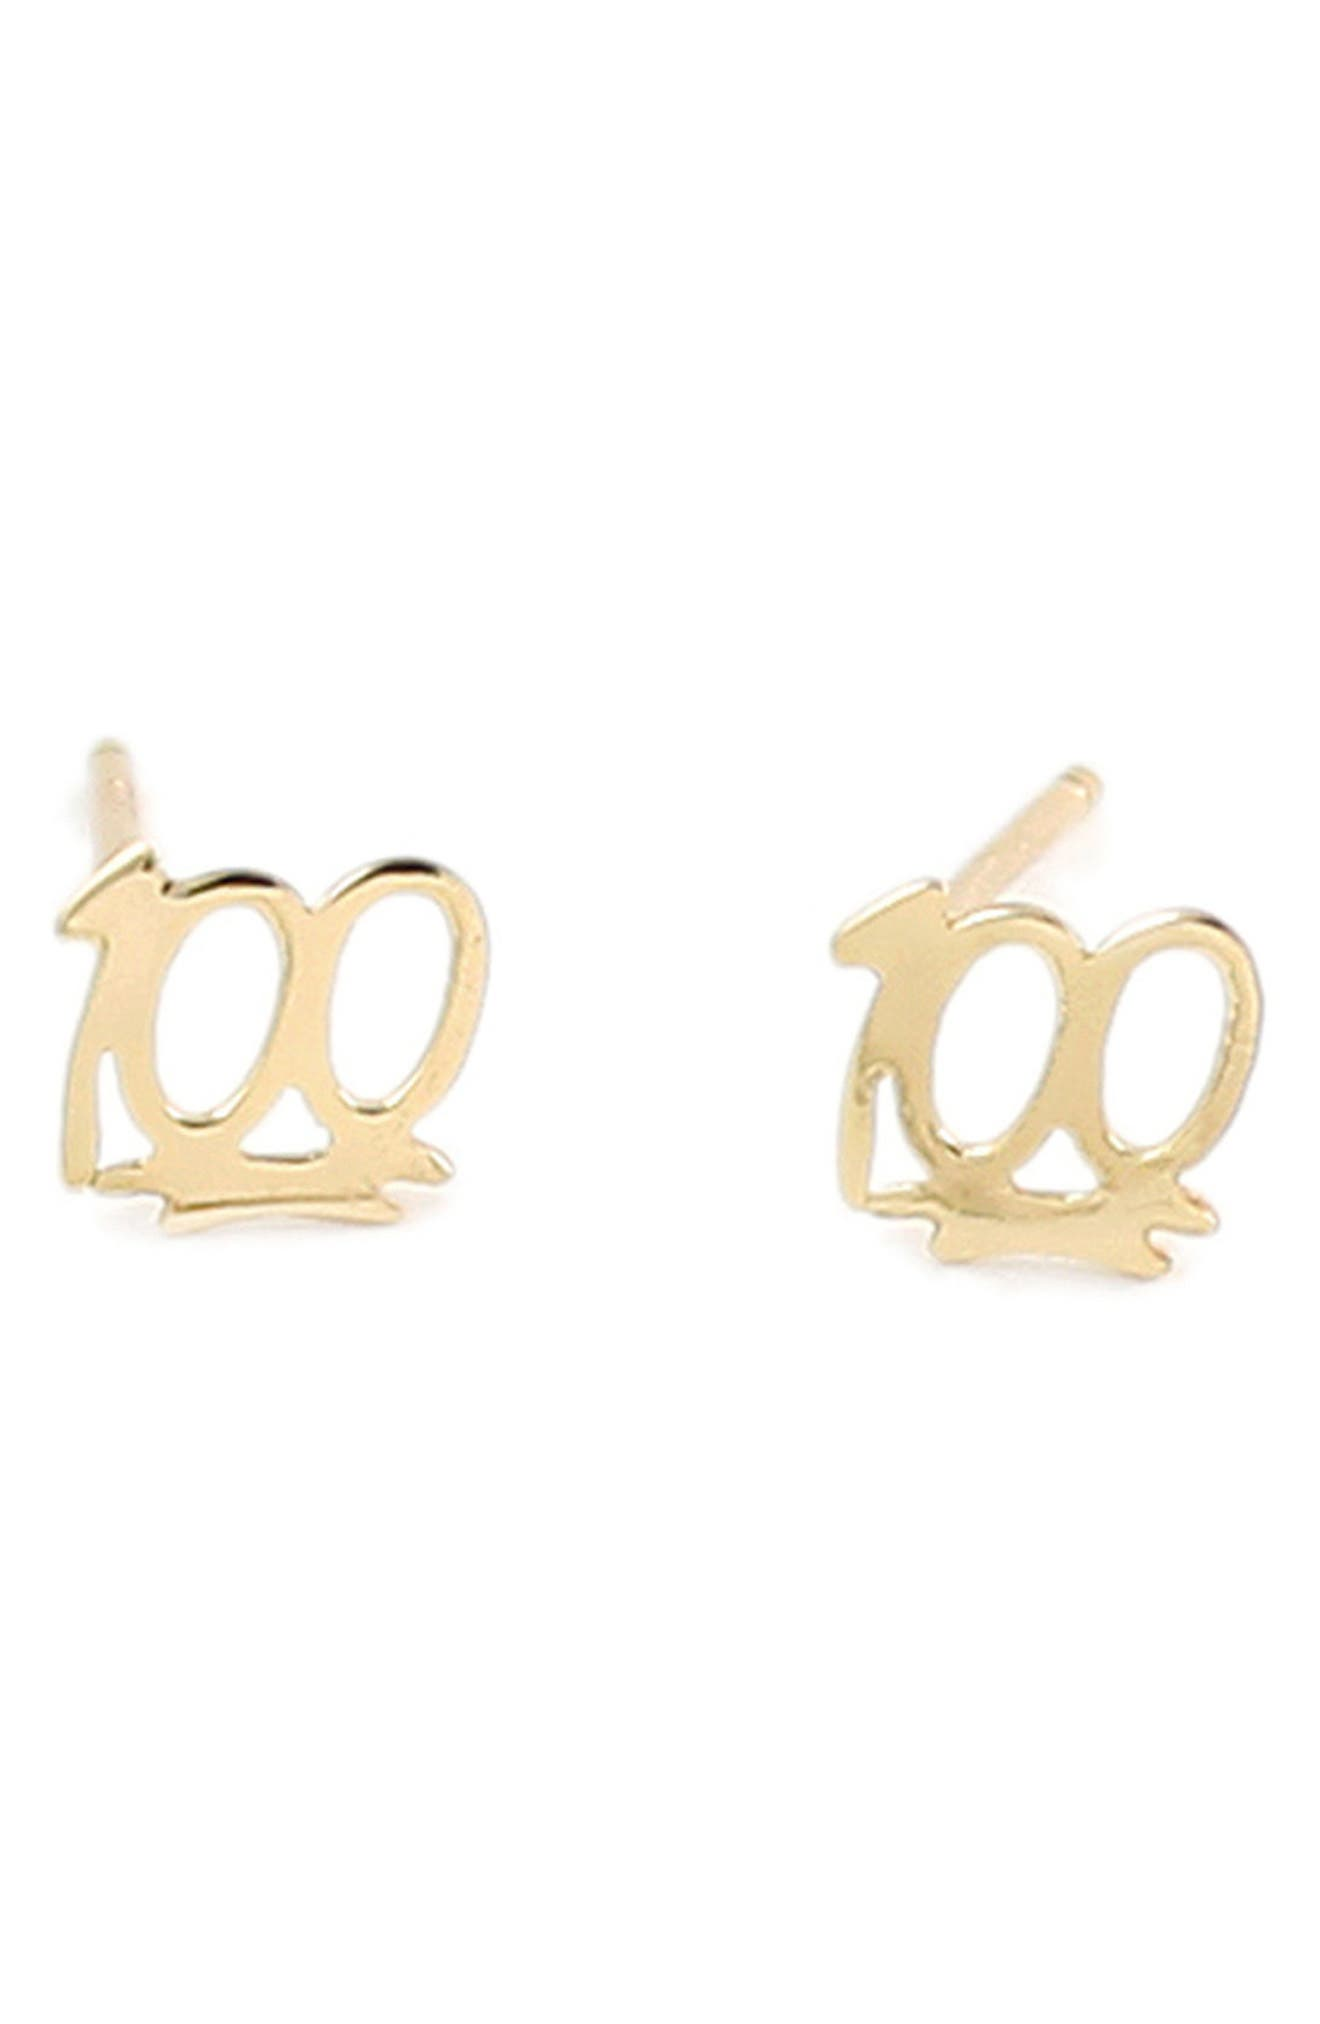 100 Stud Earrings,                         Main,                         color, Gold